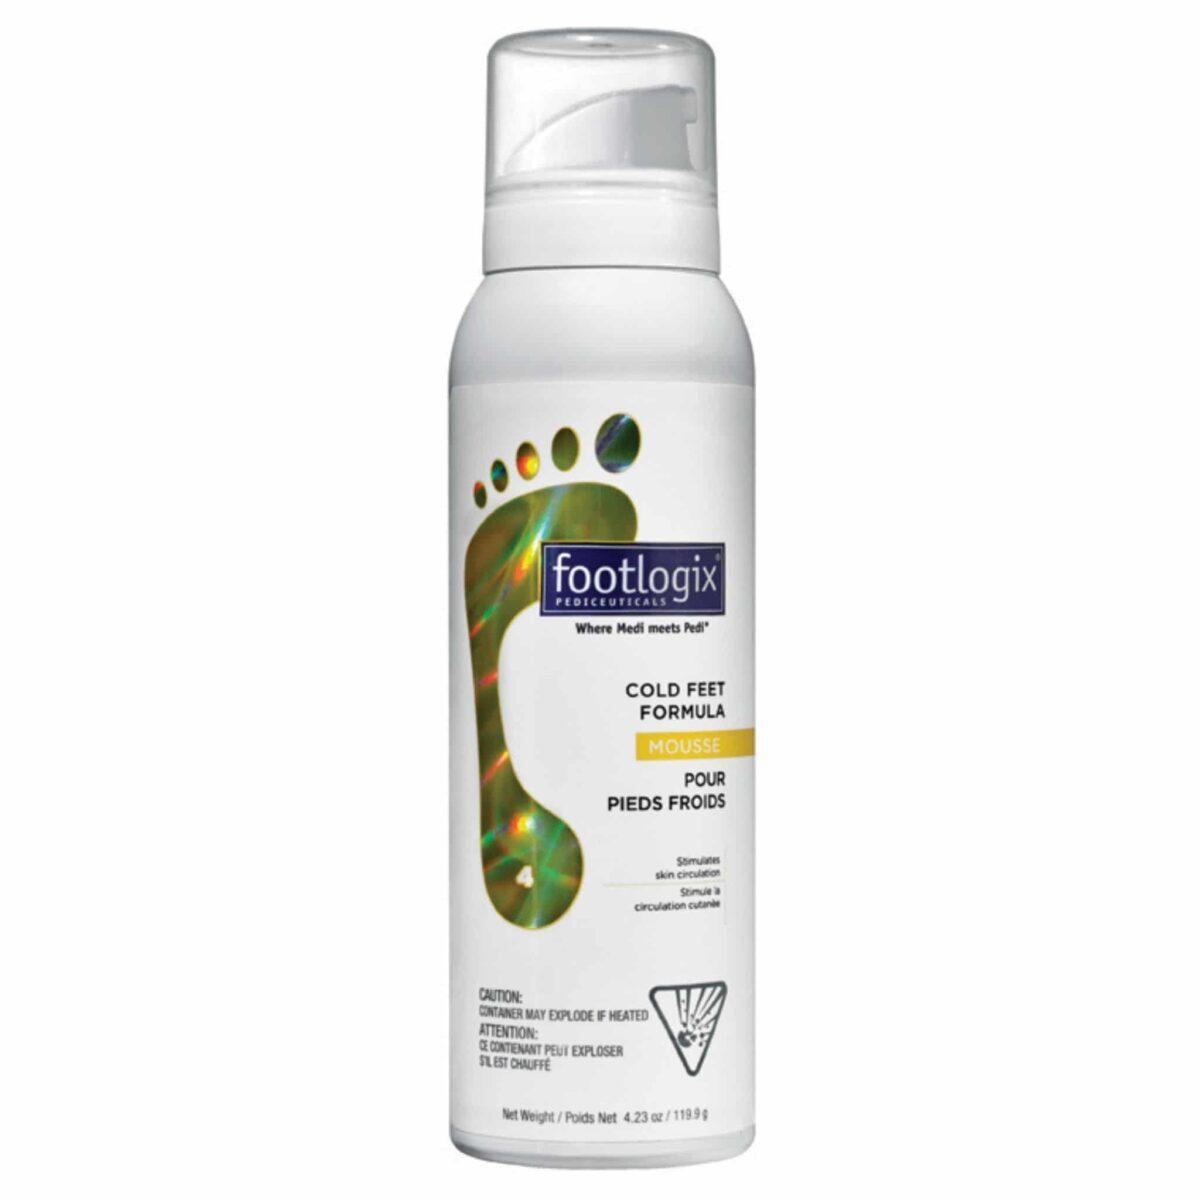 Footlogix Cold Feet Formula